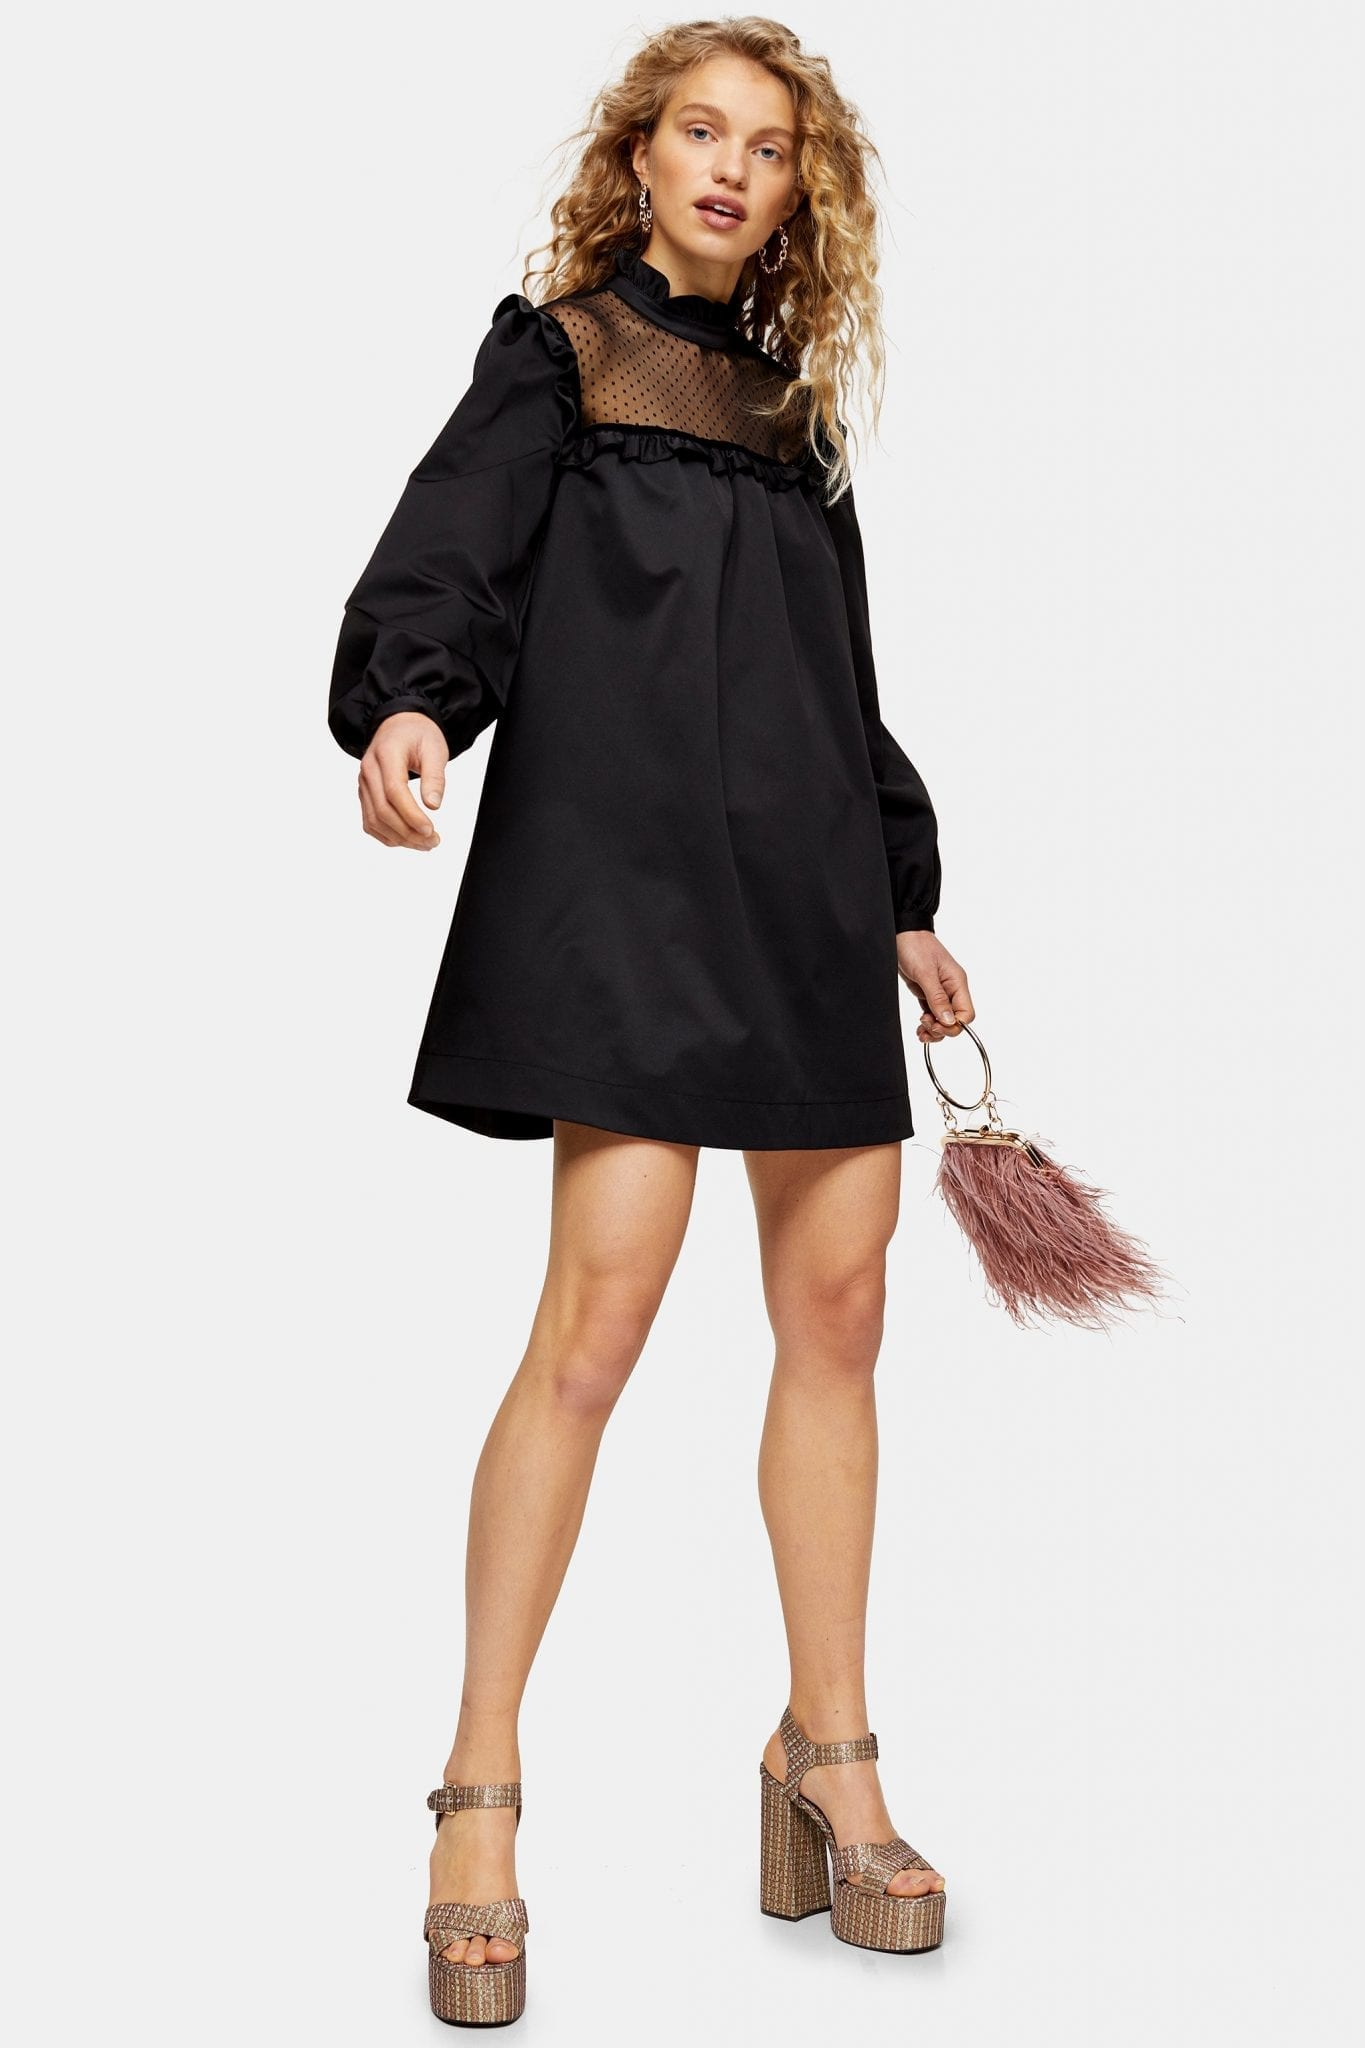 TOPSHOP Black Ottoman Mini Dress